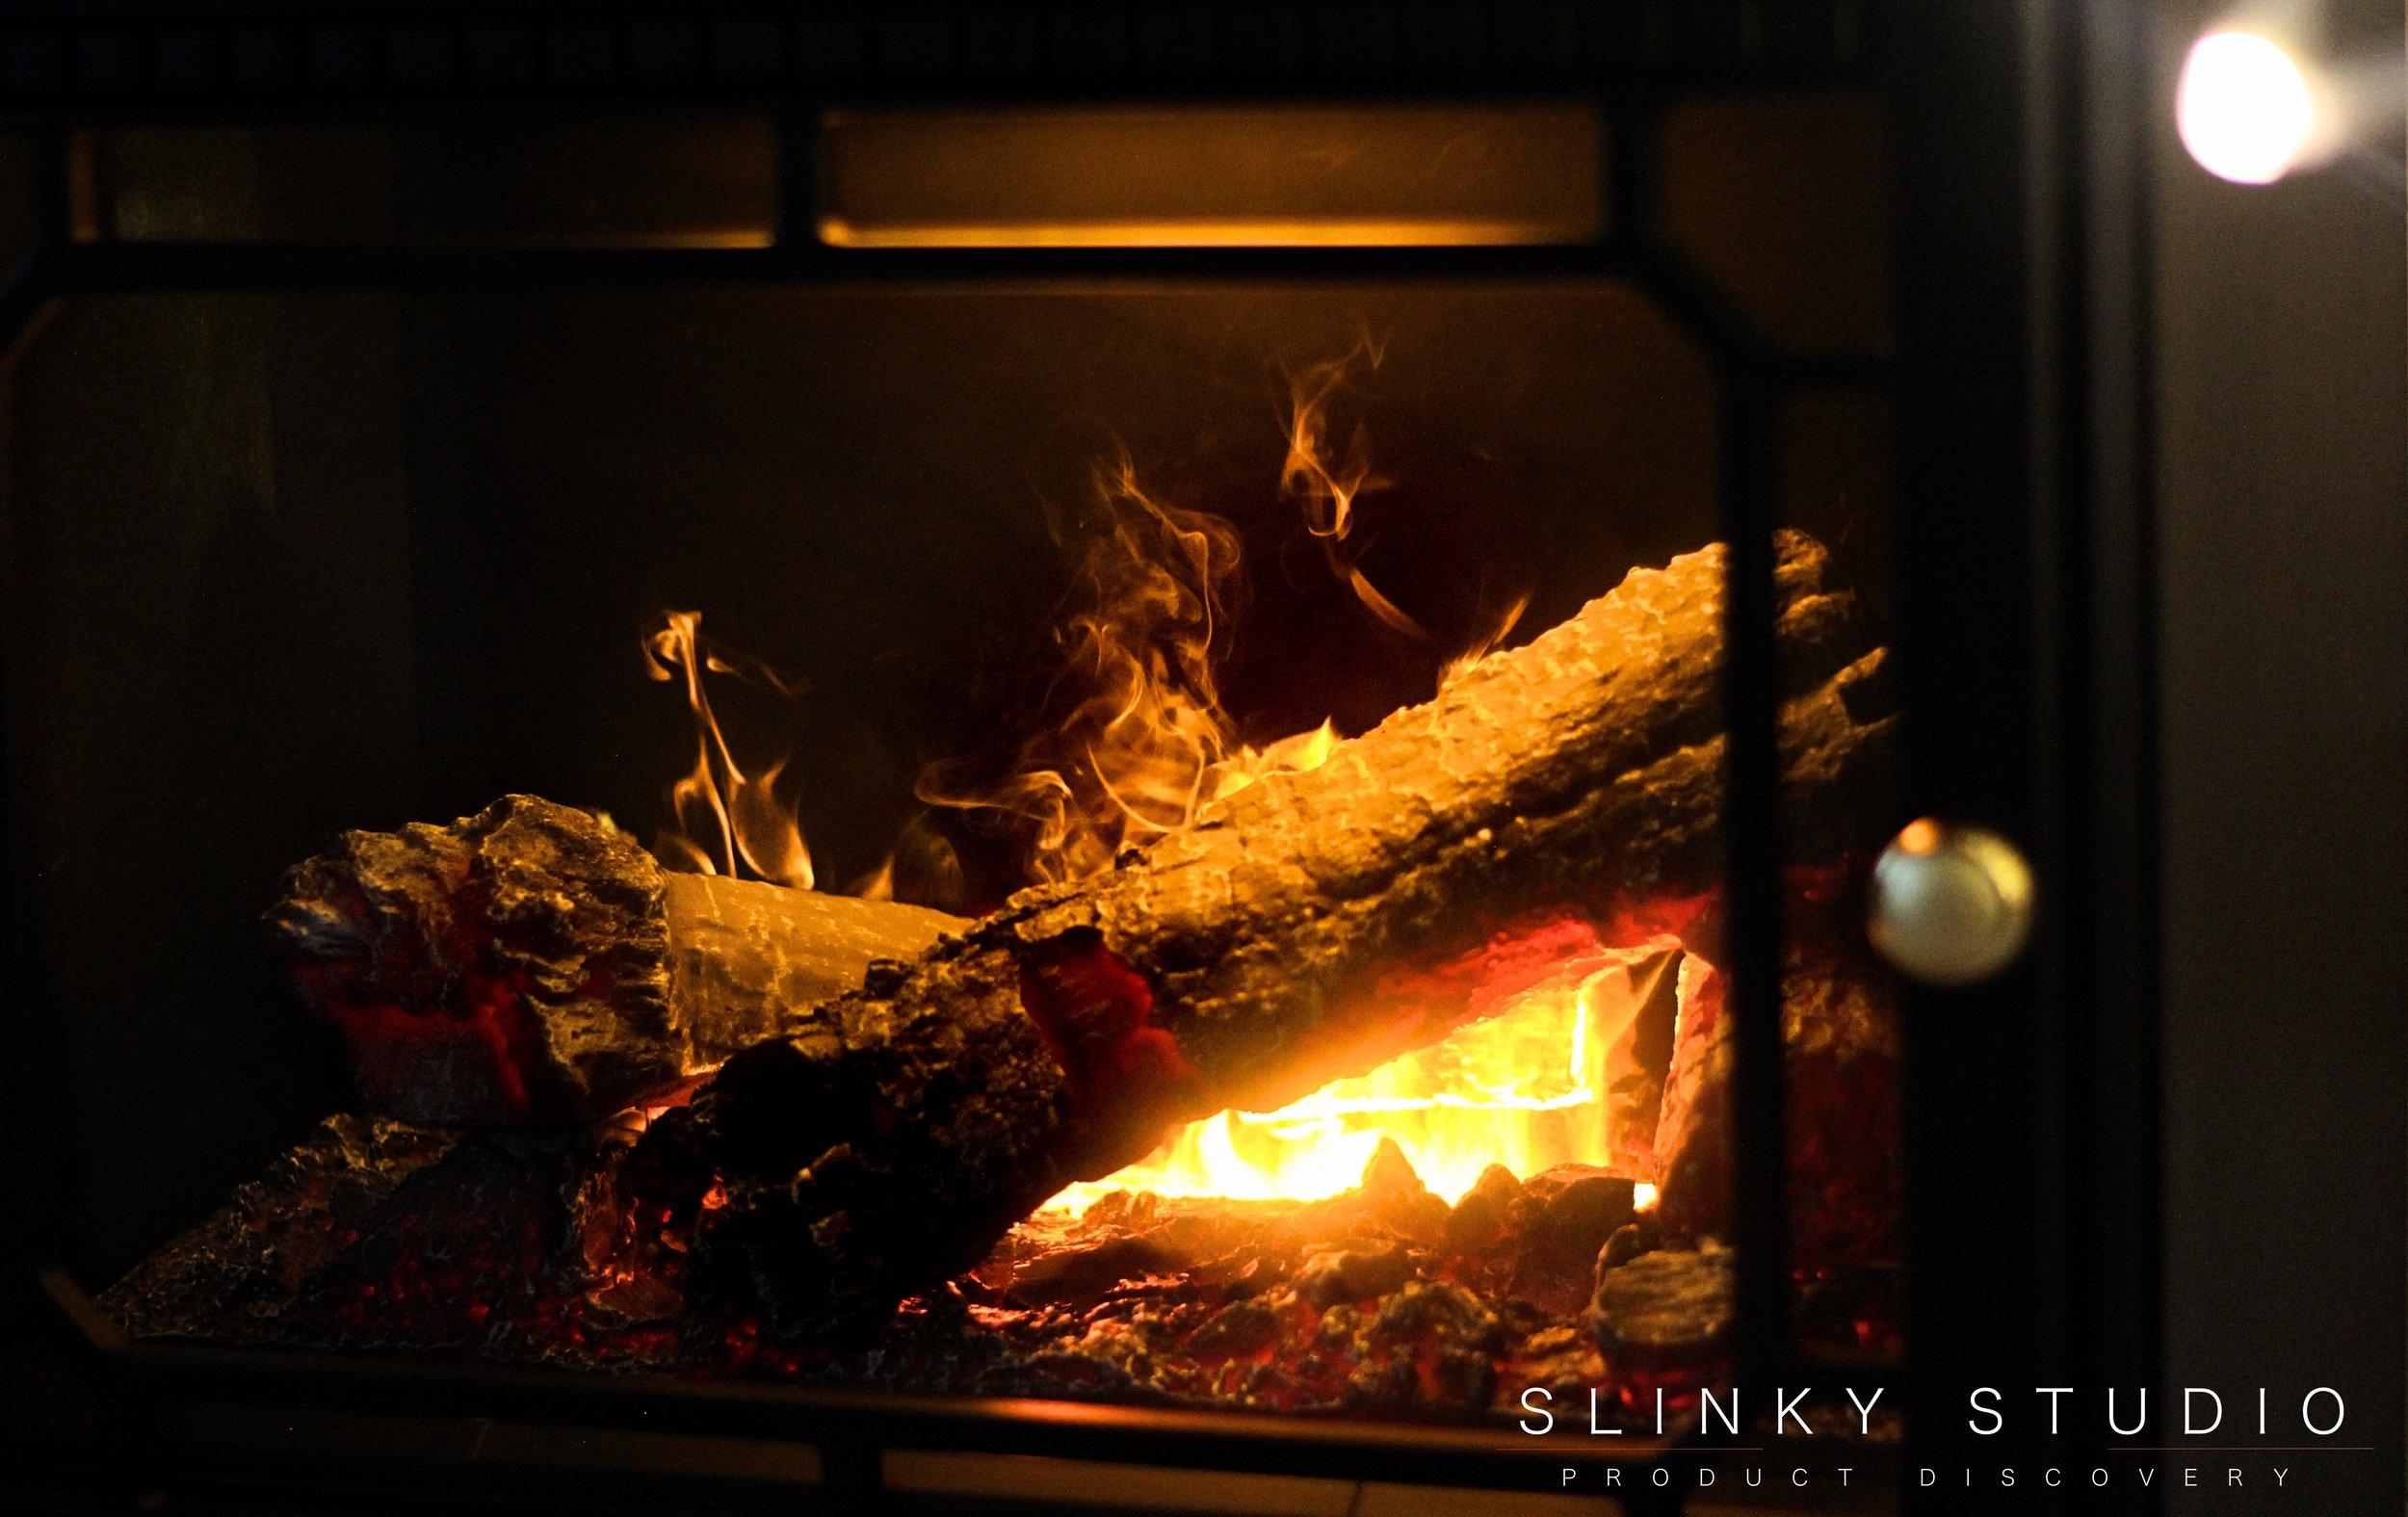 Dimplex Opti-myst Gosford Electric Stove Flame Fire Through Door.jpg